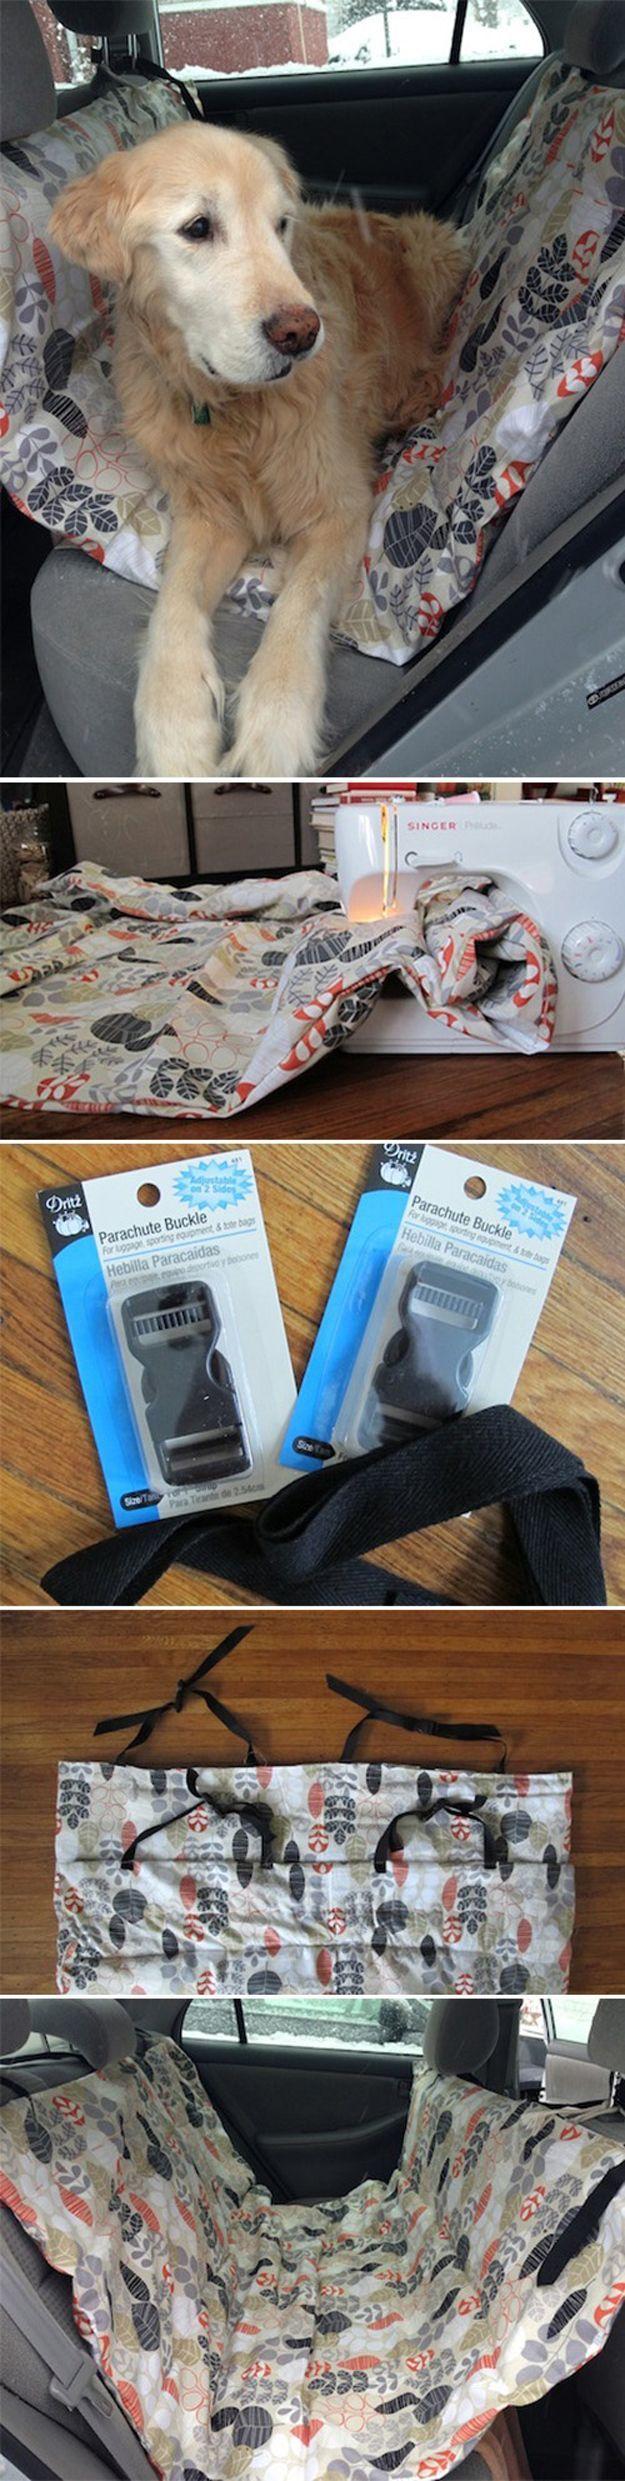 Easy DIY Hammock for Dogs | DIY Car Hammock by DIY Ready at http://diyready.com/diy-dog-crafts-mans-best-friend-will-love/